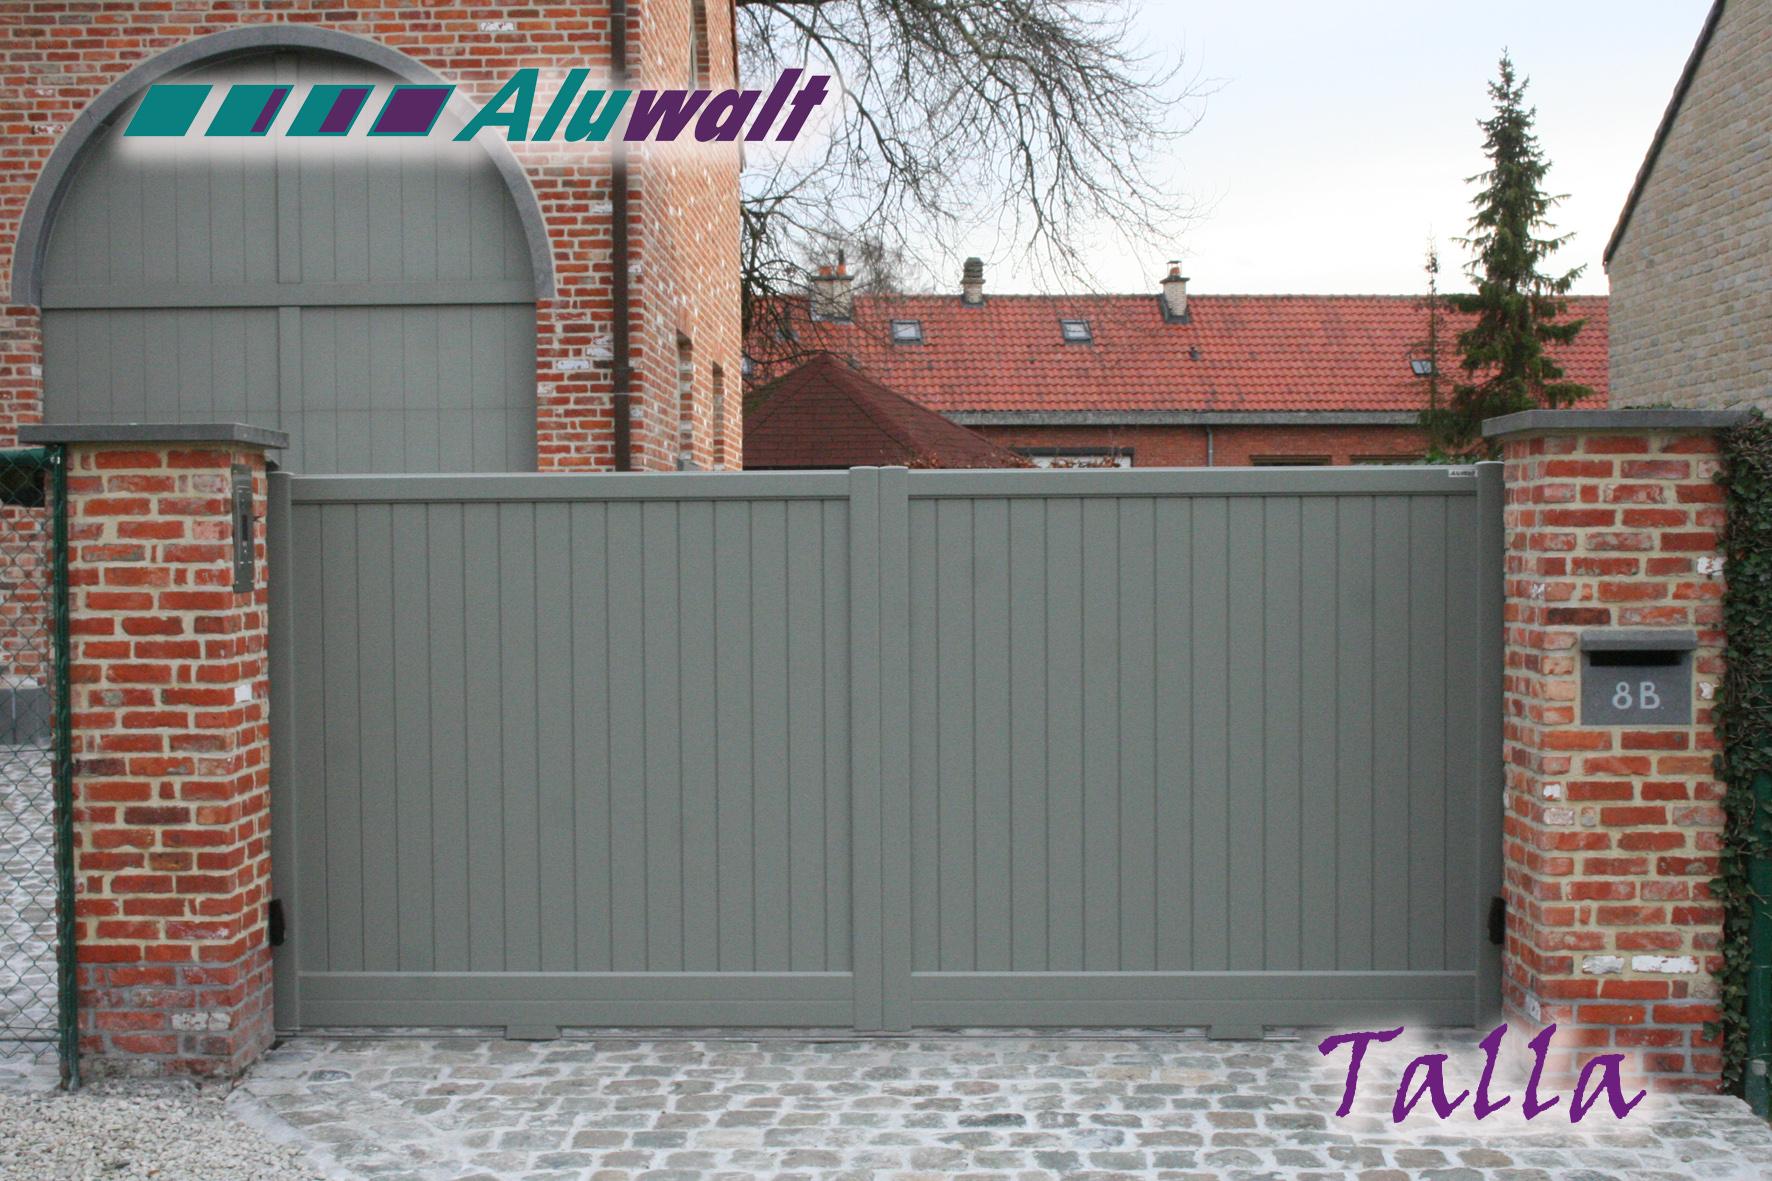 Talla4